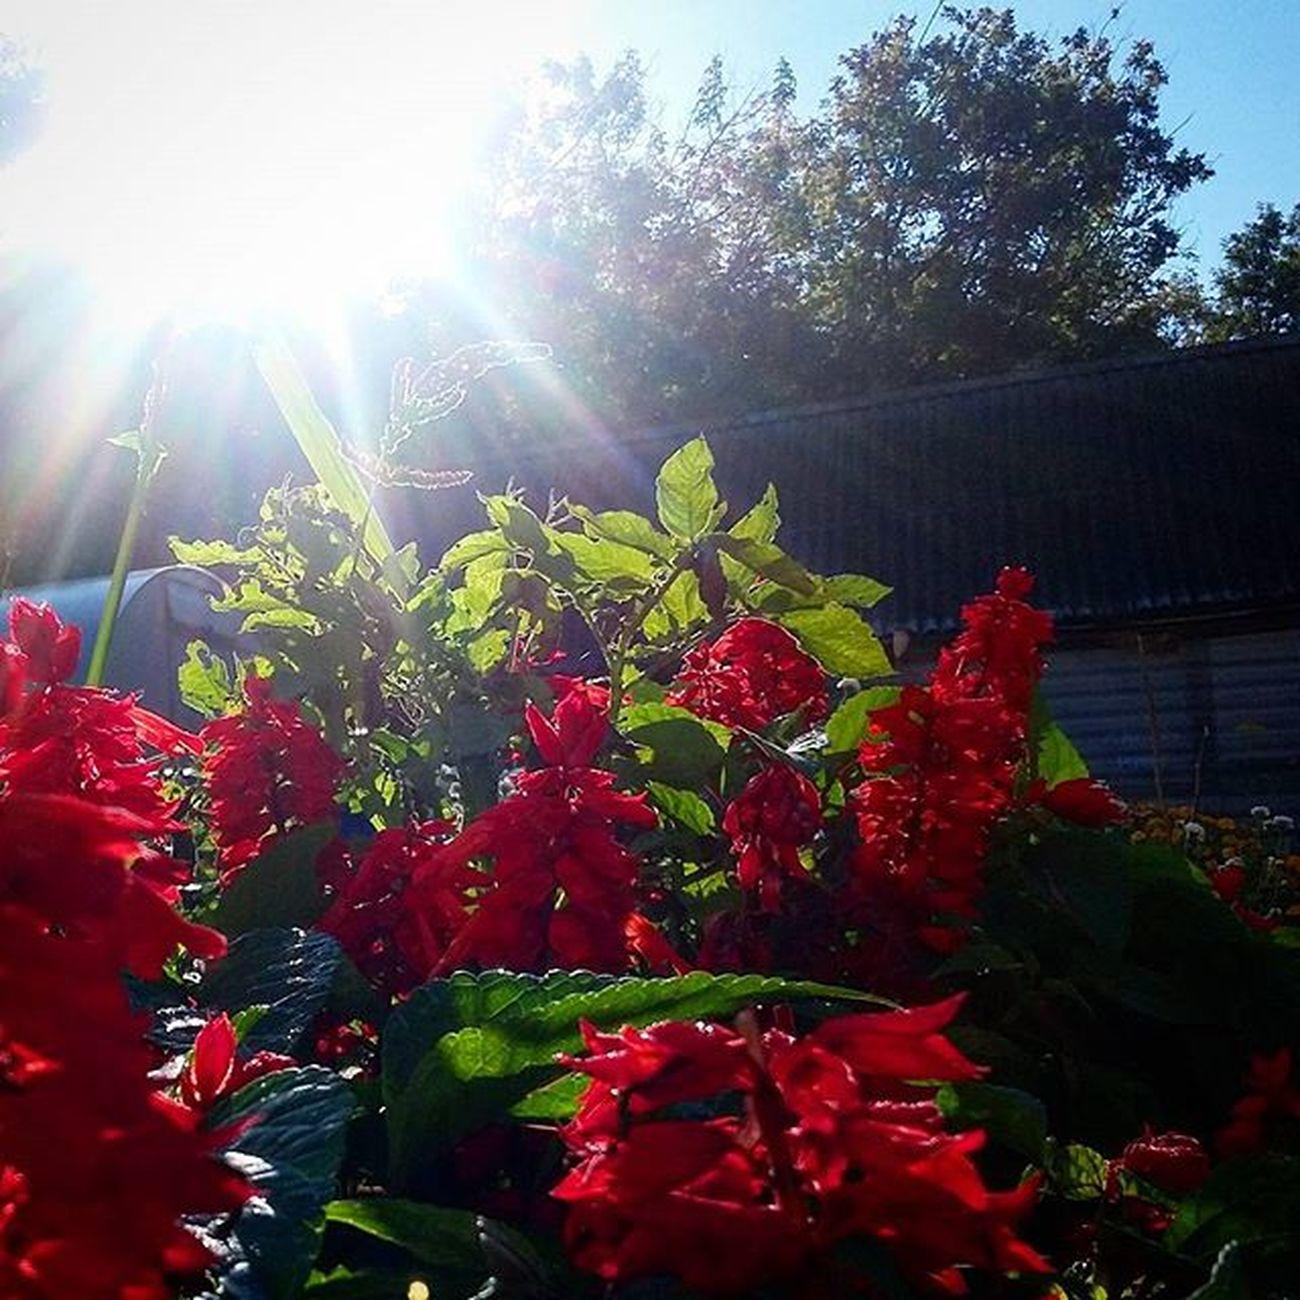 Доброе утро всем! Завтра уже осень! ) доброеутротатарстан бирюли вгостях Sun morningtime instaday time hashtags 2015 summerday trees flowers утро сальвия август31 завтраосень